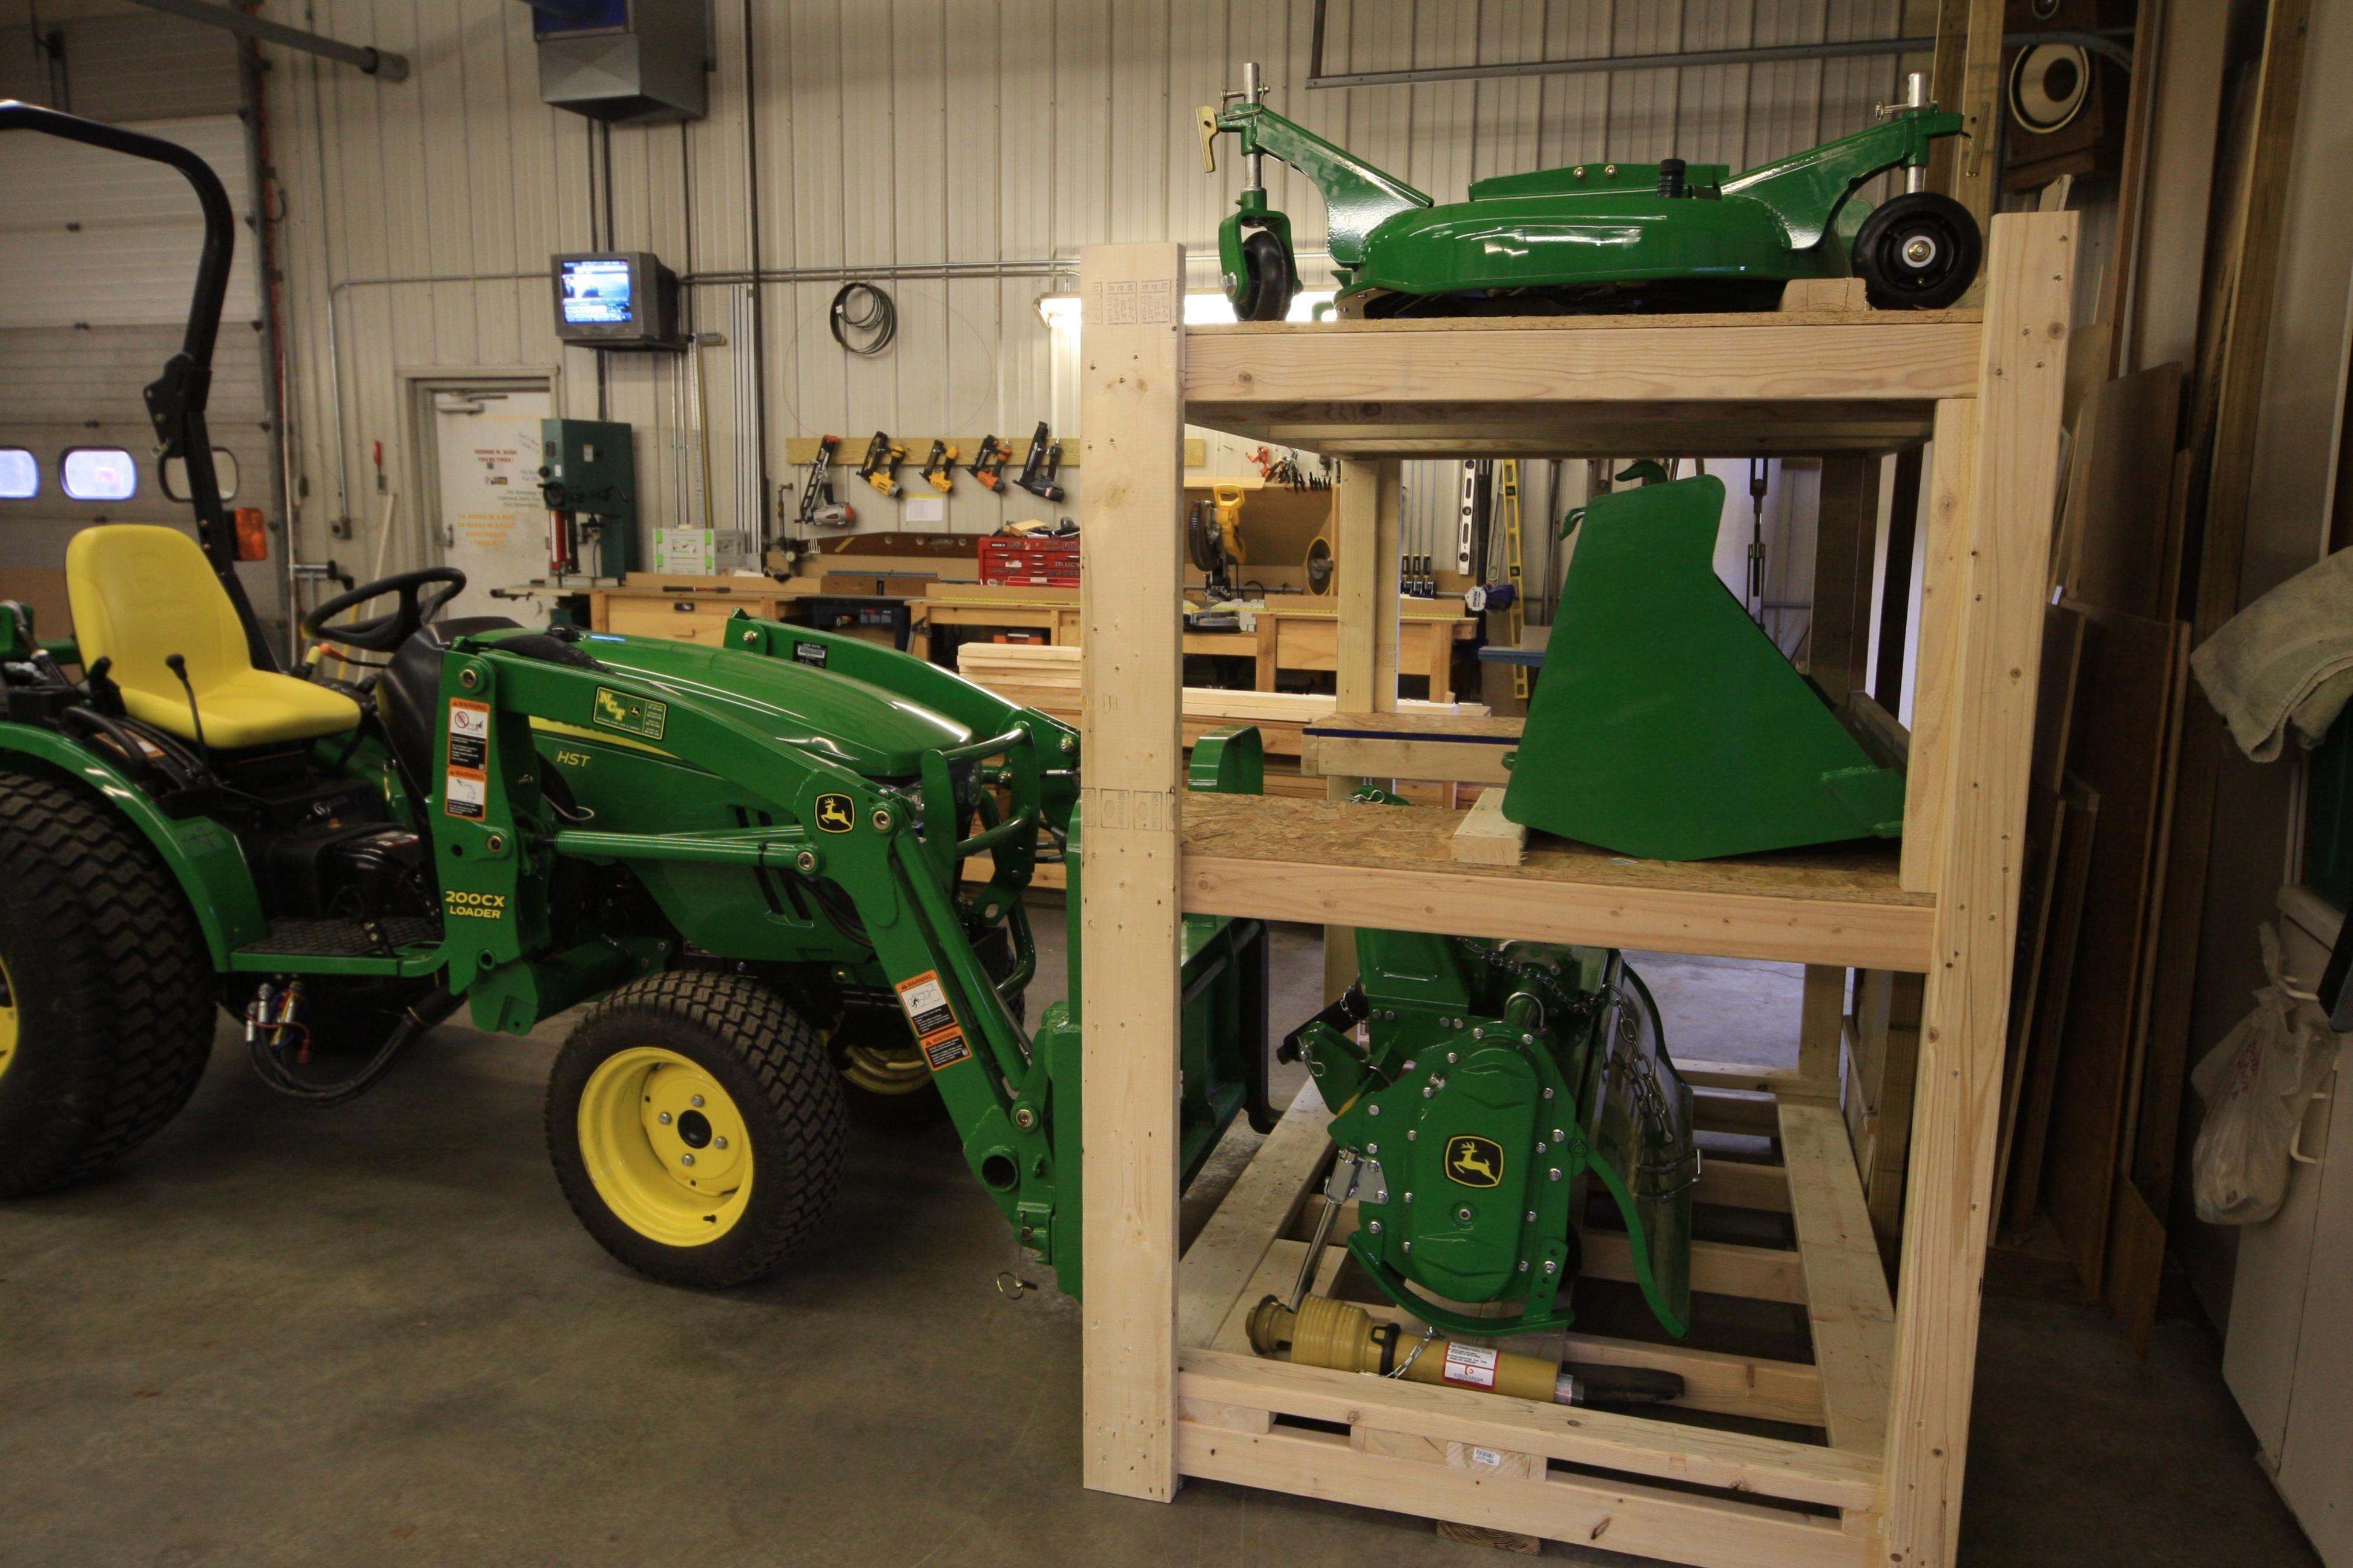 Implement Storage Rack in 2020 | Deere, Traktor